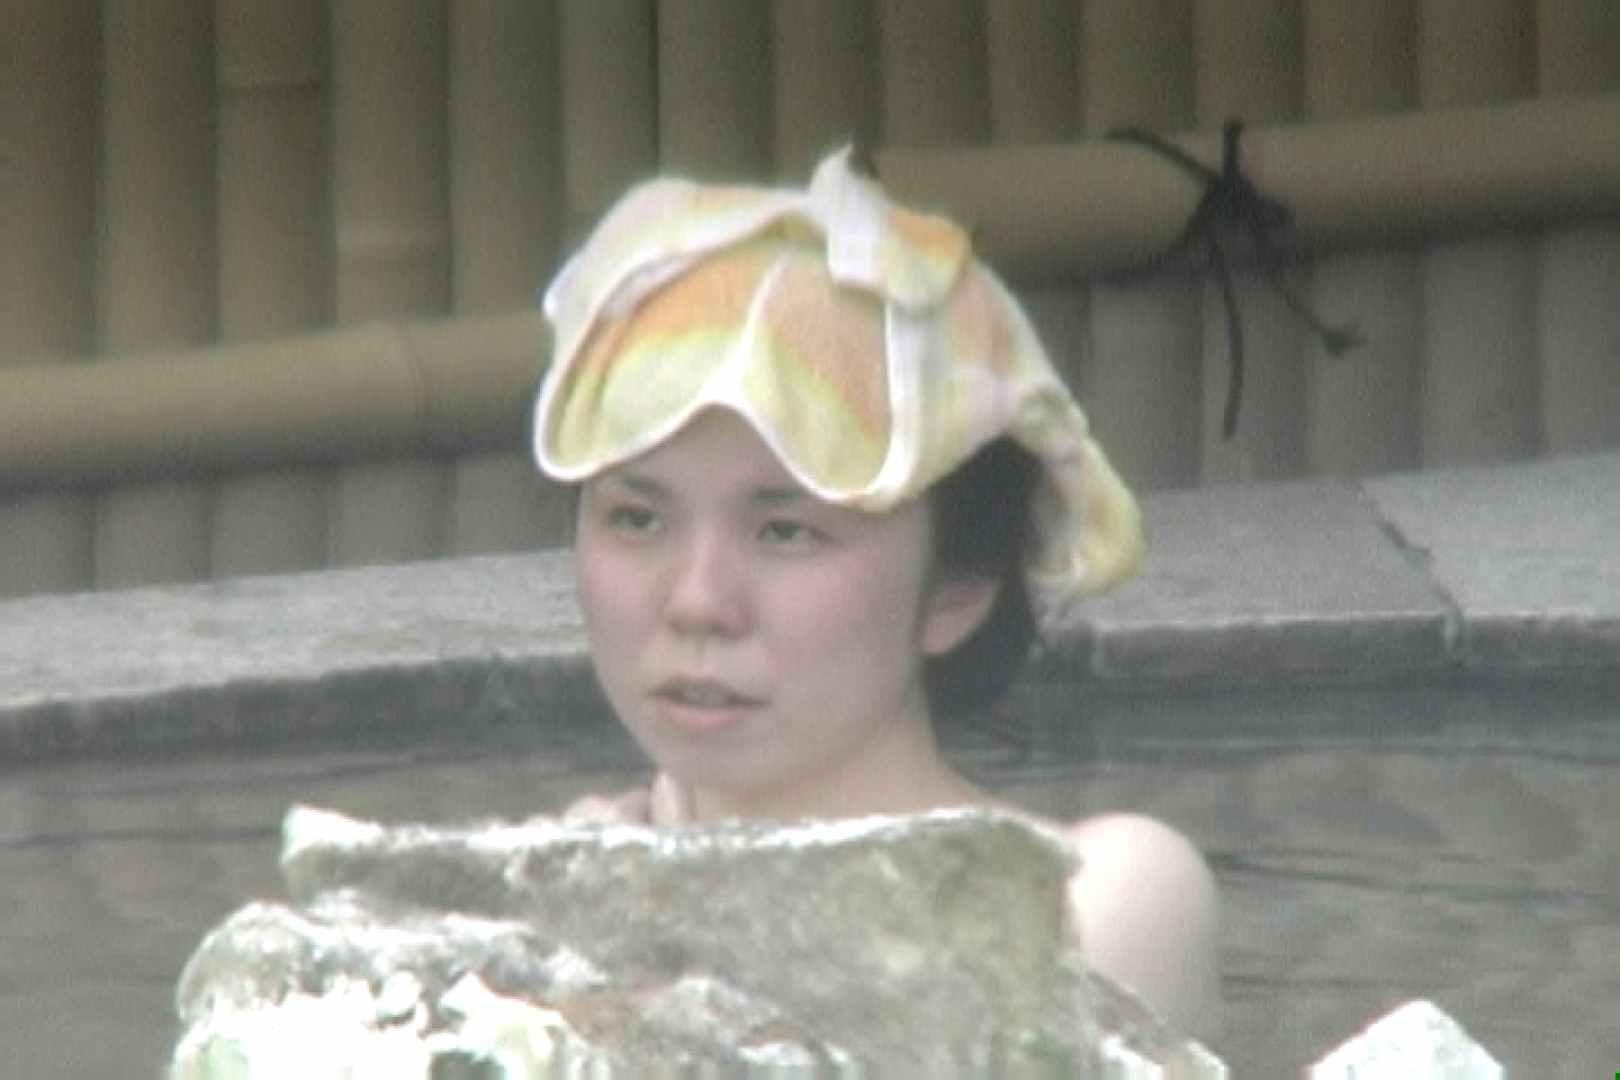 Aquaな露天風呂Vol.687 盗撮シリーズ | 露天風呂編  93PIX 75